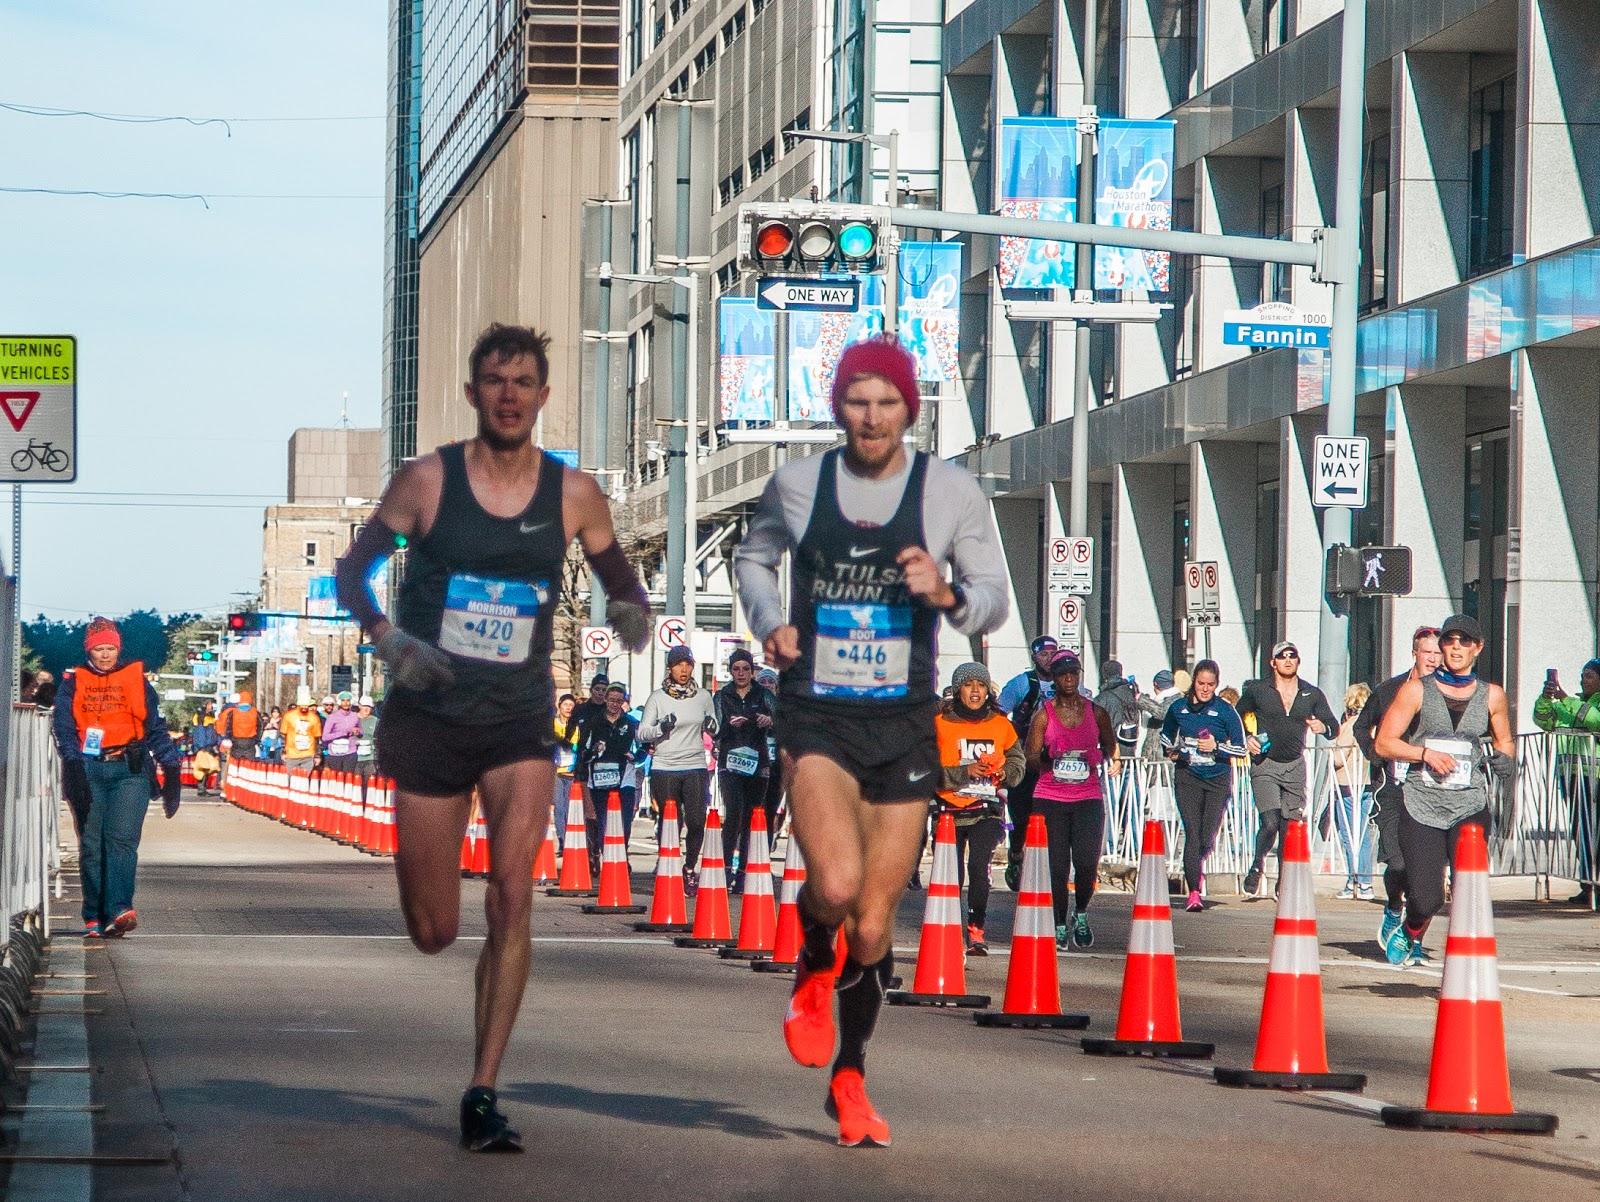 We ran fearlessly at the Houston Marathon